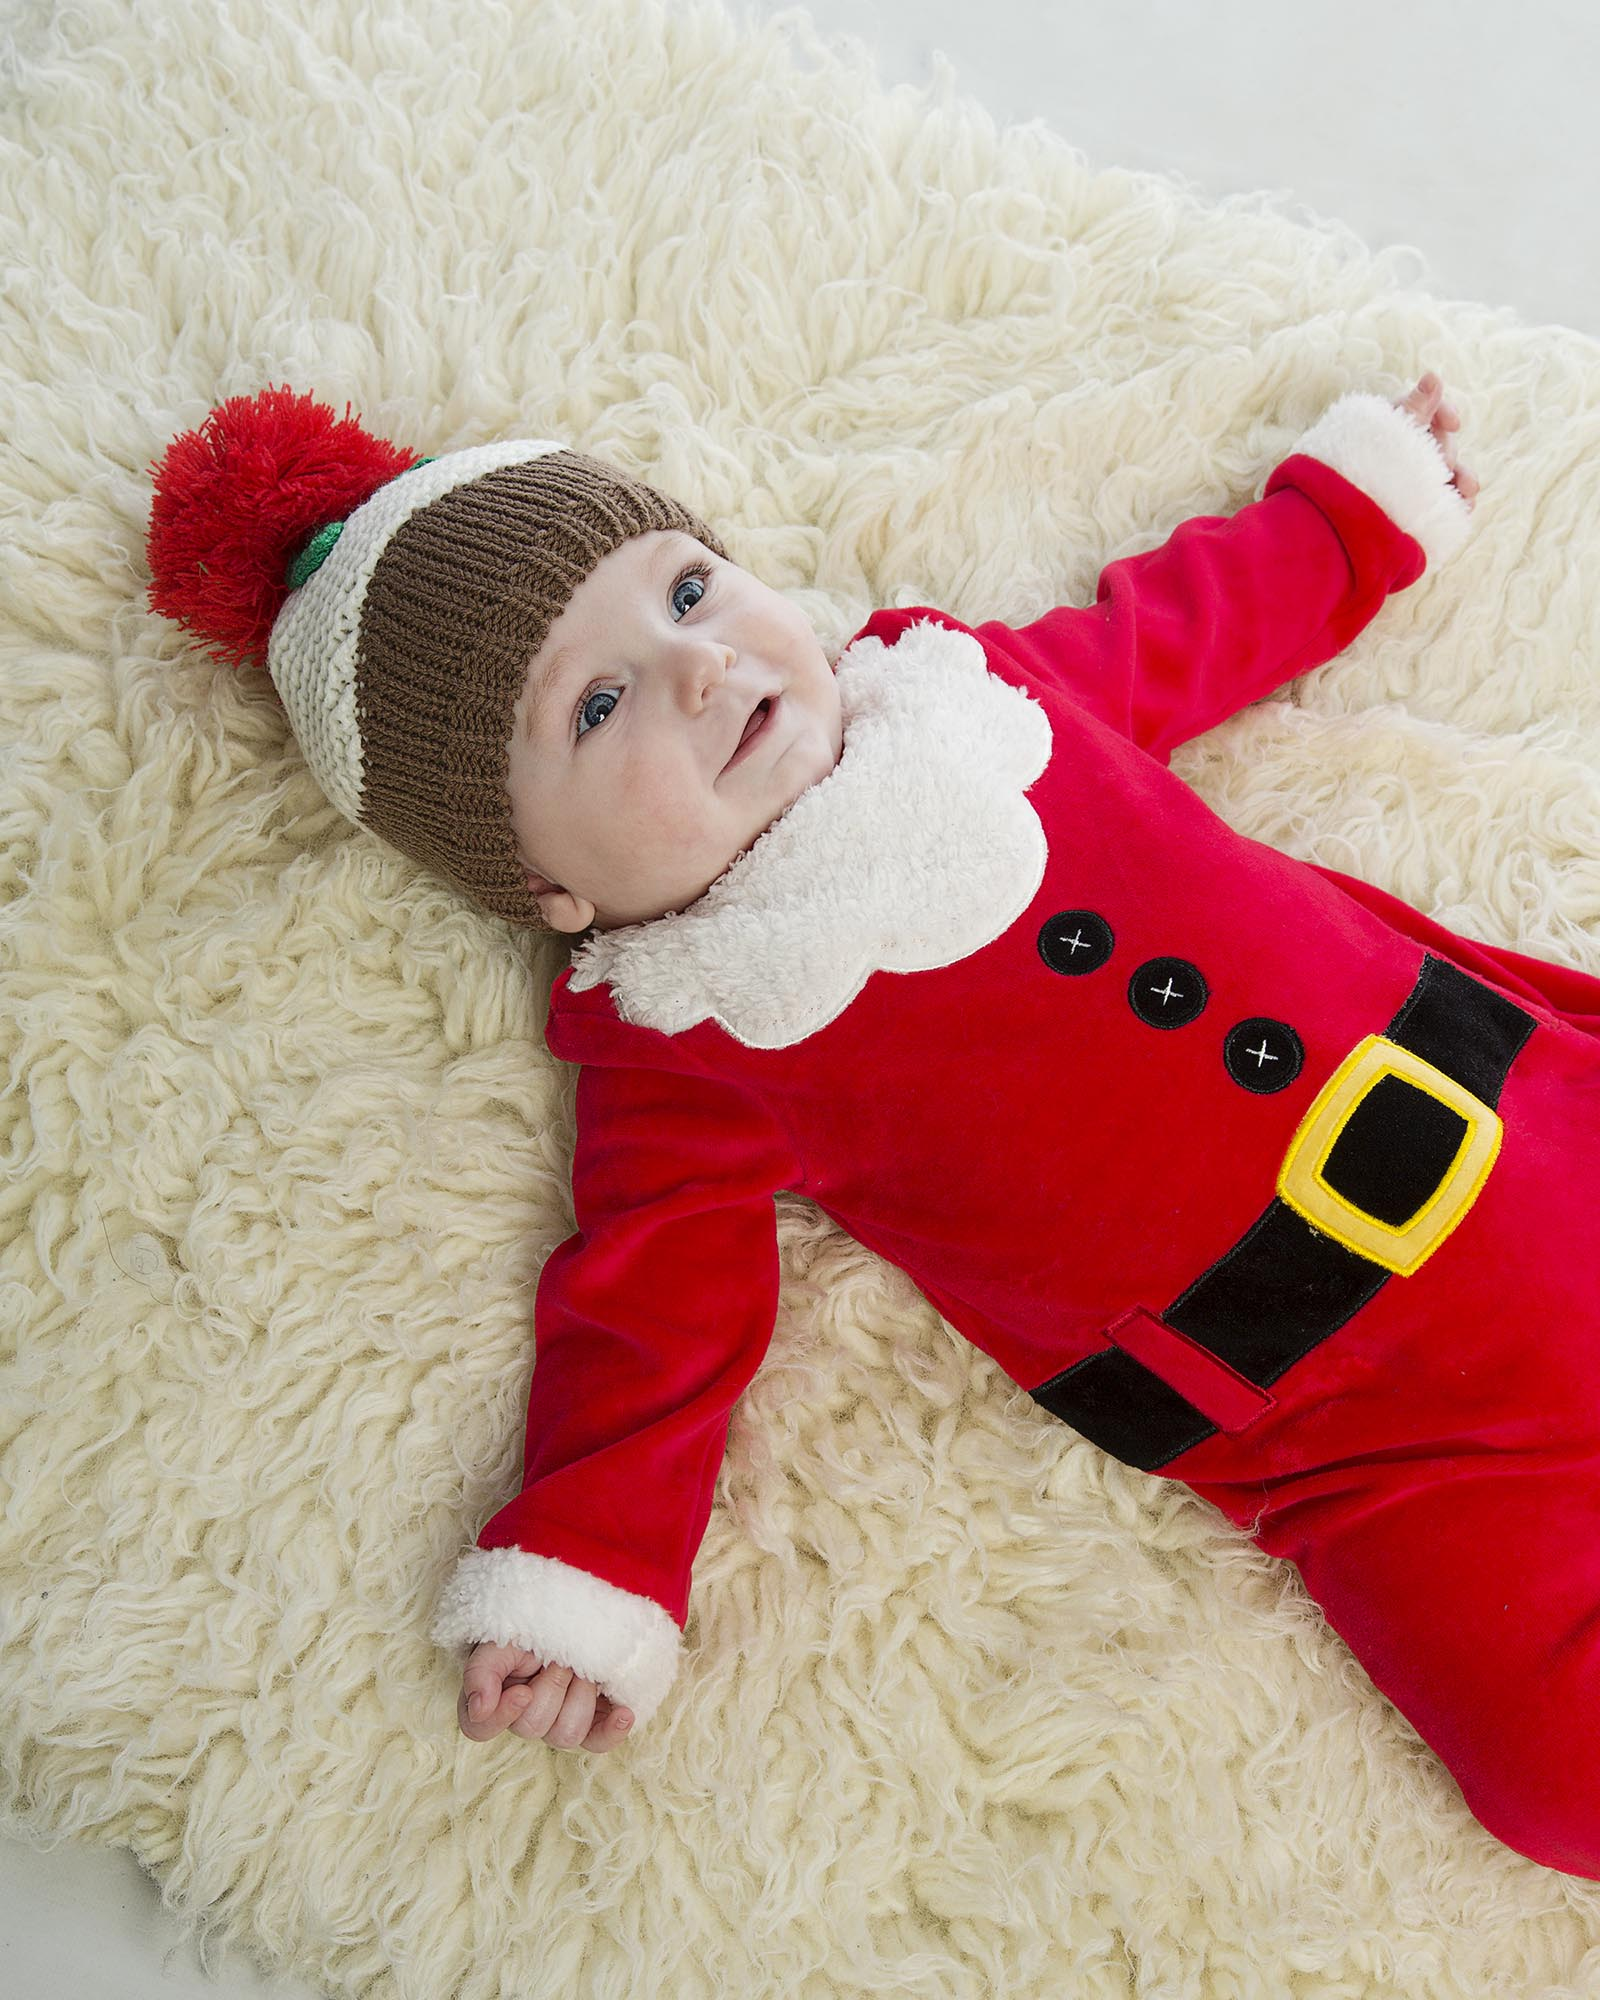 newborn baby dress as santa D Studios graphy